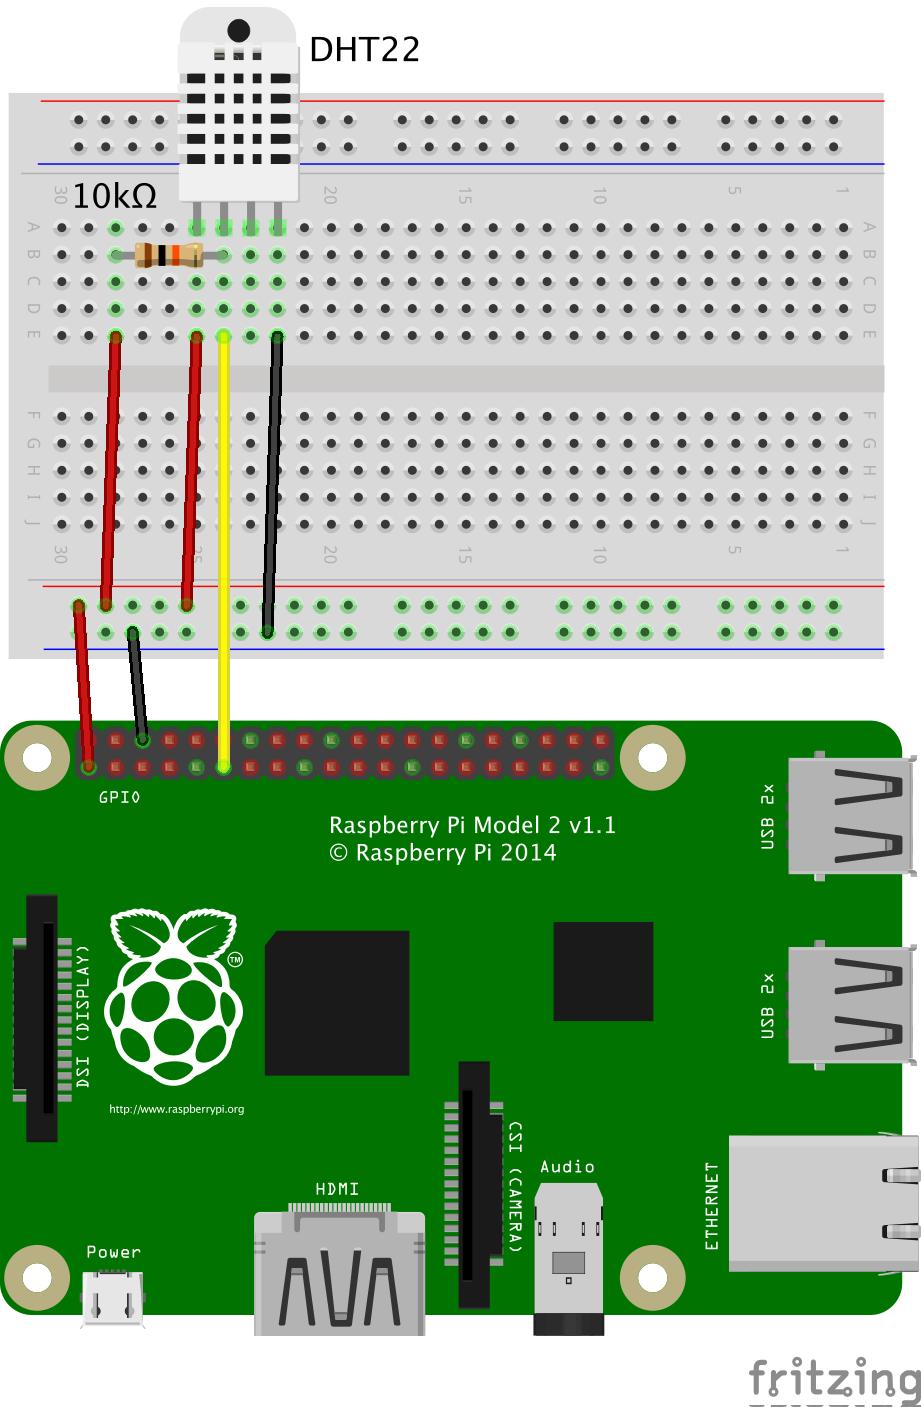 Raspberry Pi 2 & DHT22 Sensor Wiring Diagram